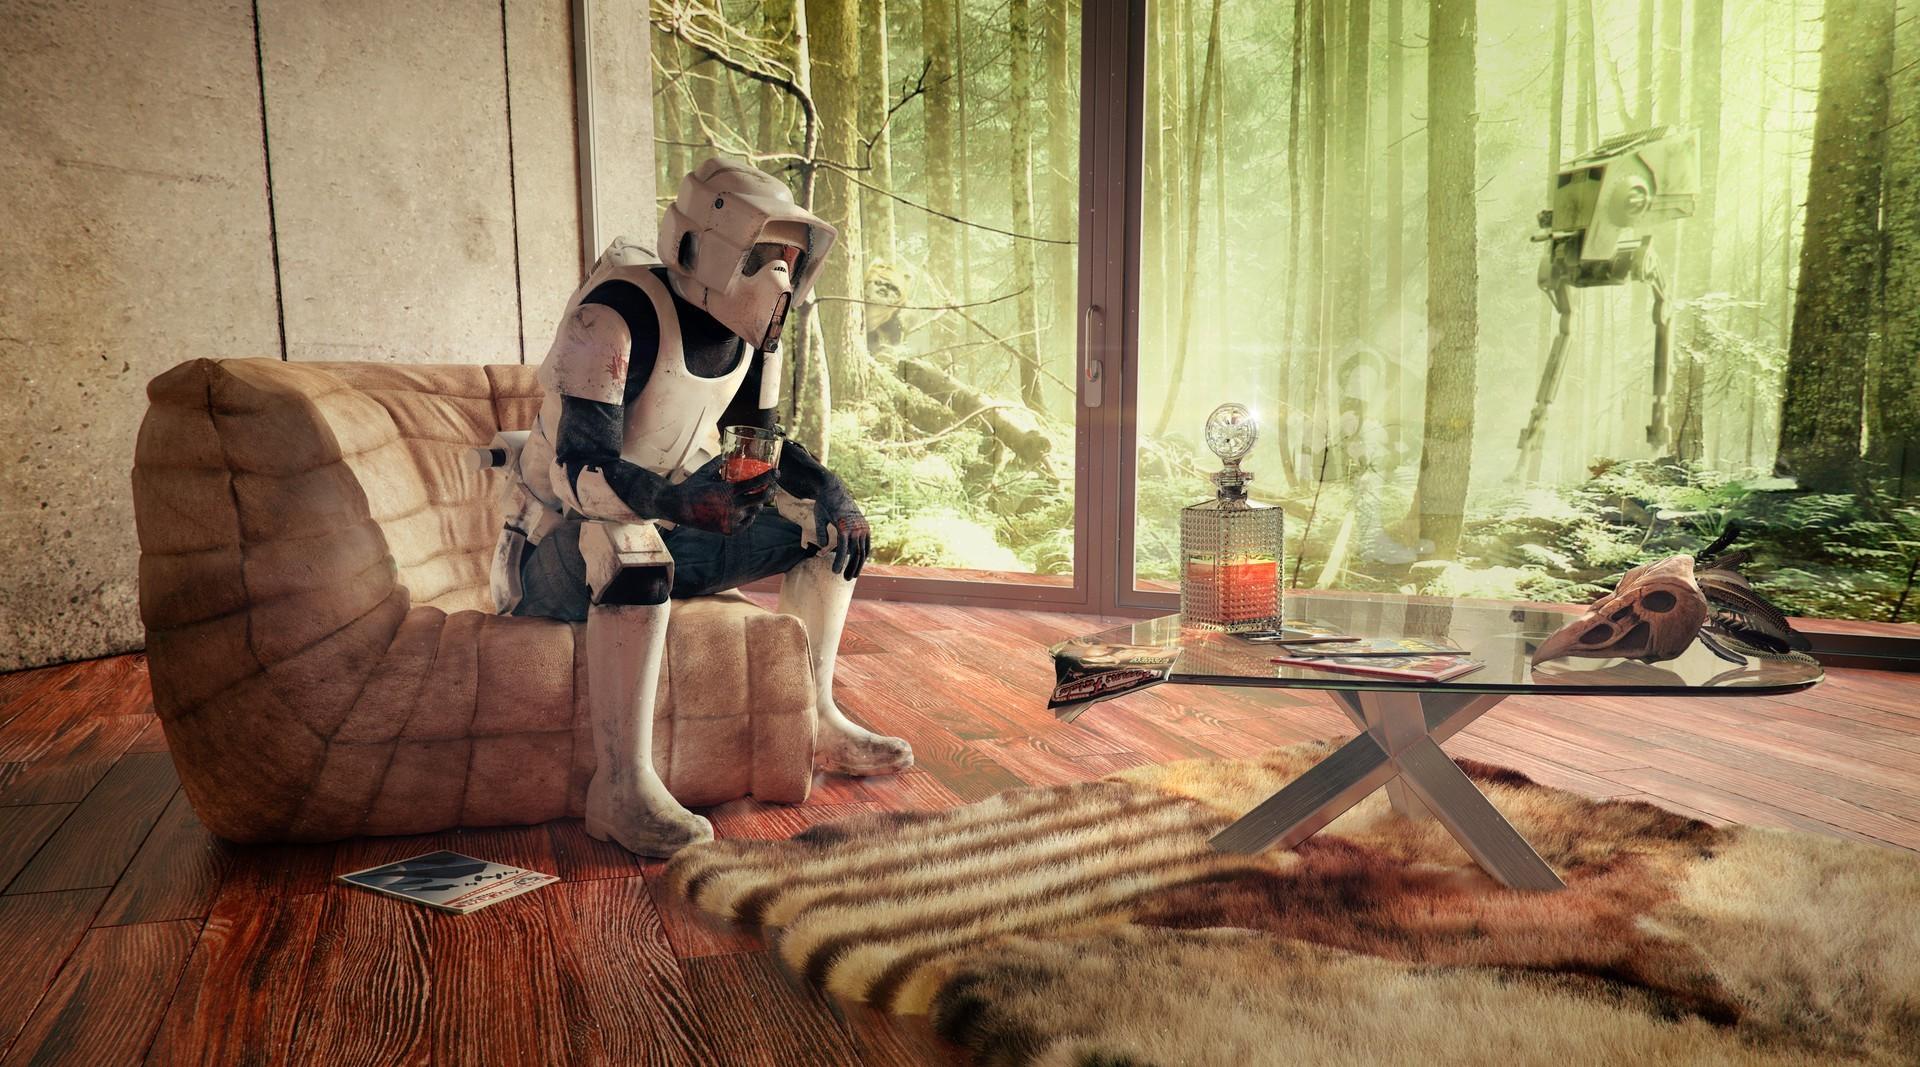 Wallpaper Star Wars Wood Interior Design At St Scout Trooper